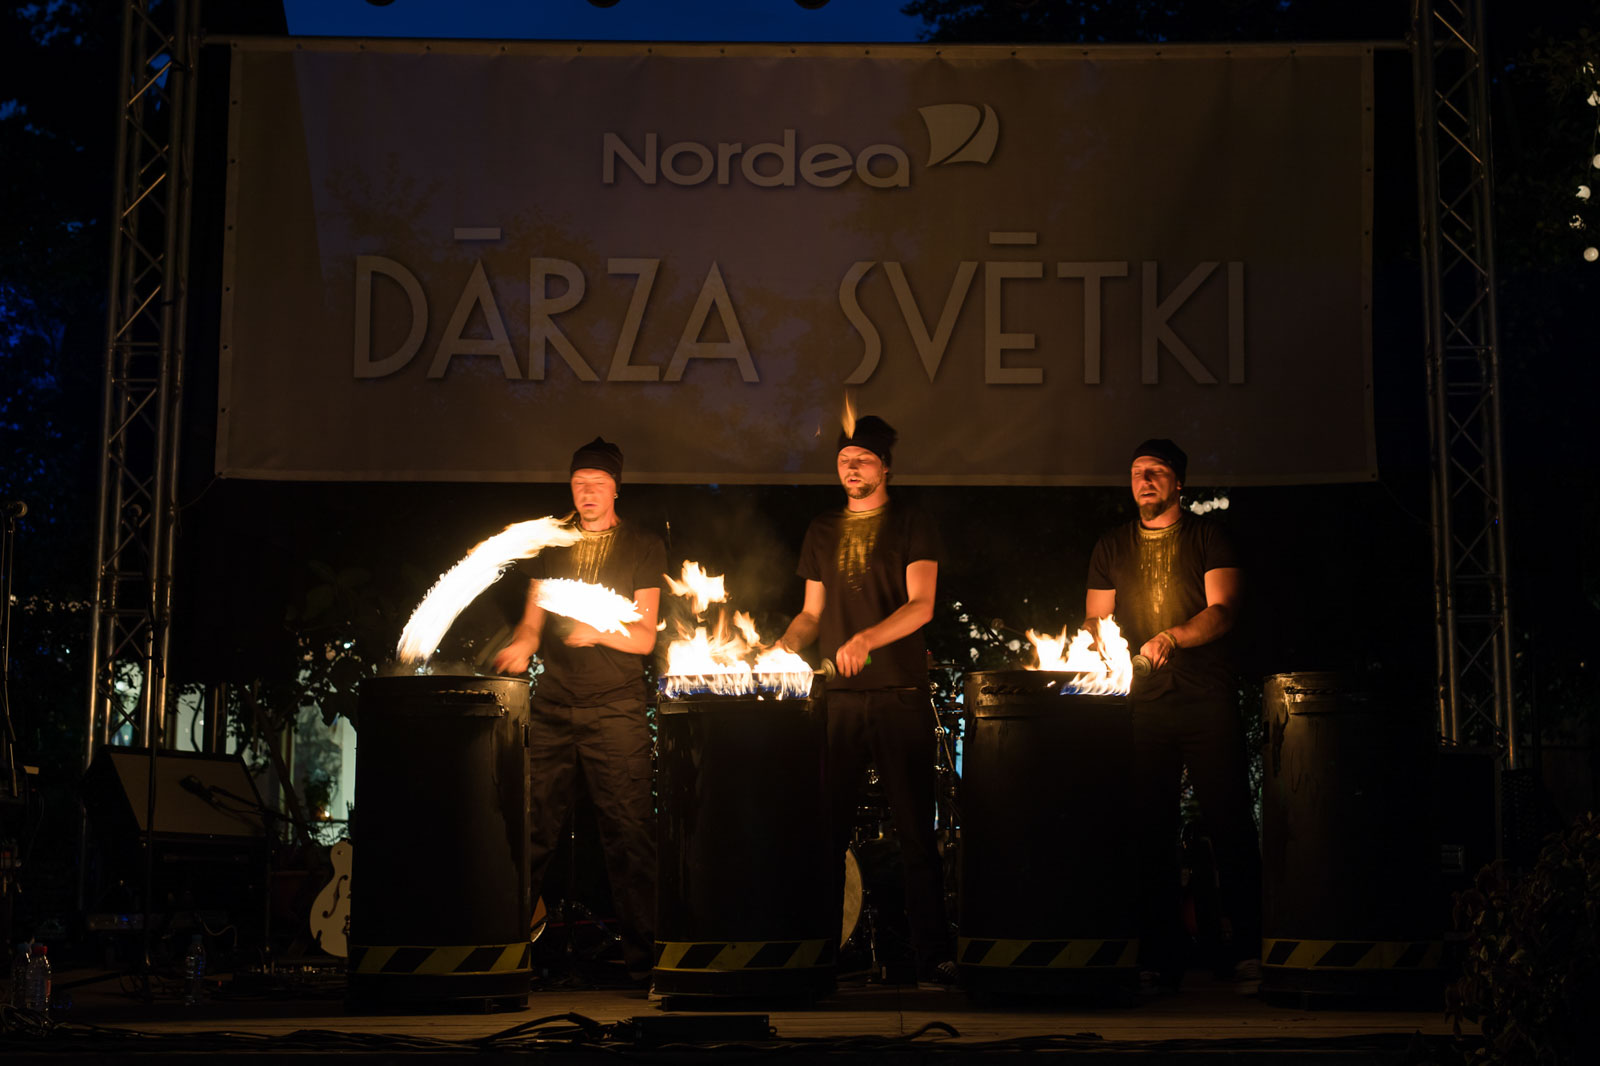 Nordea_DarzaSvetki_s-478